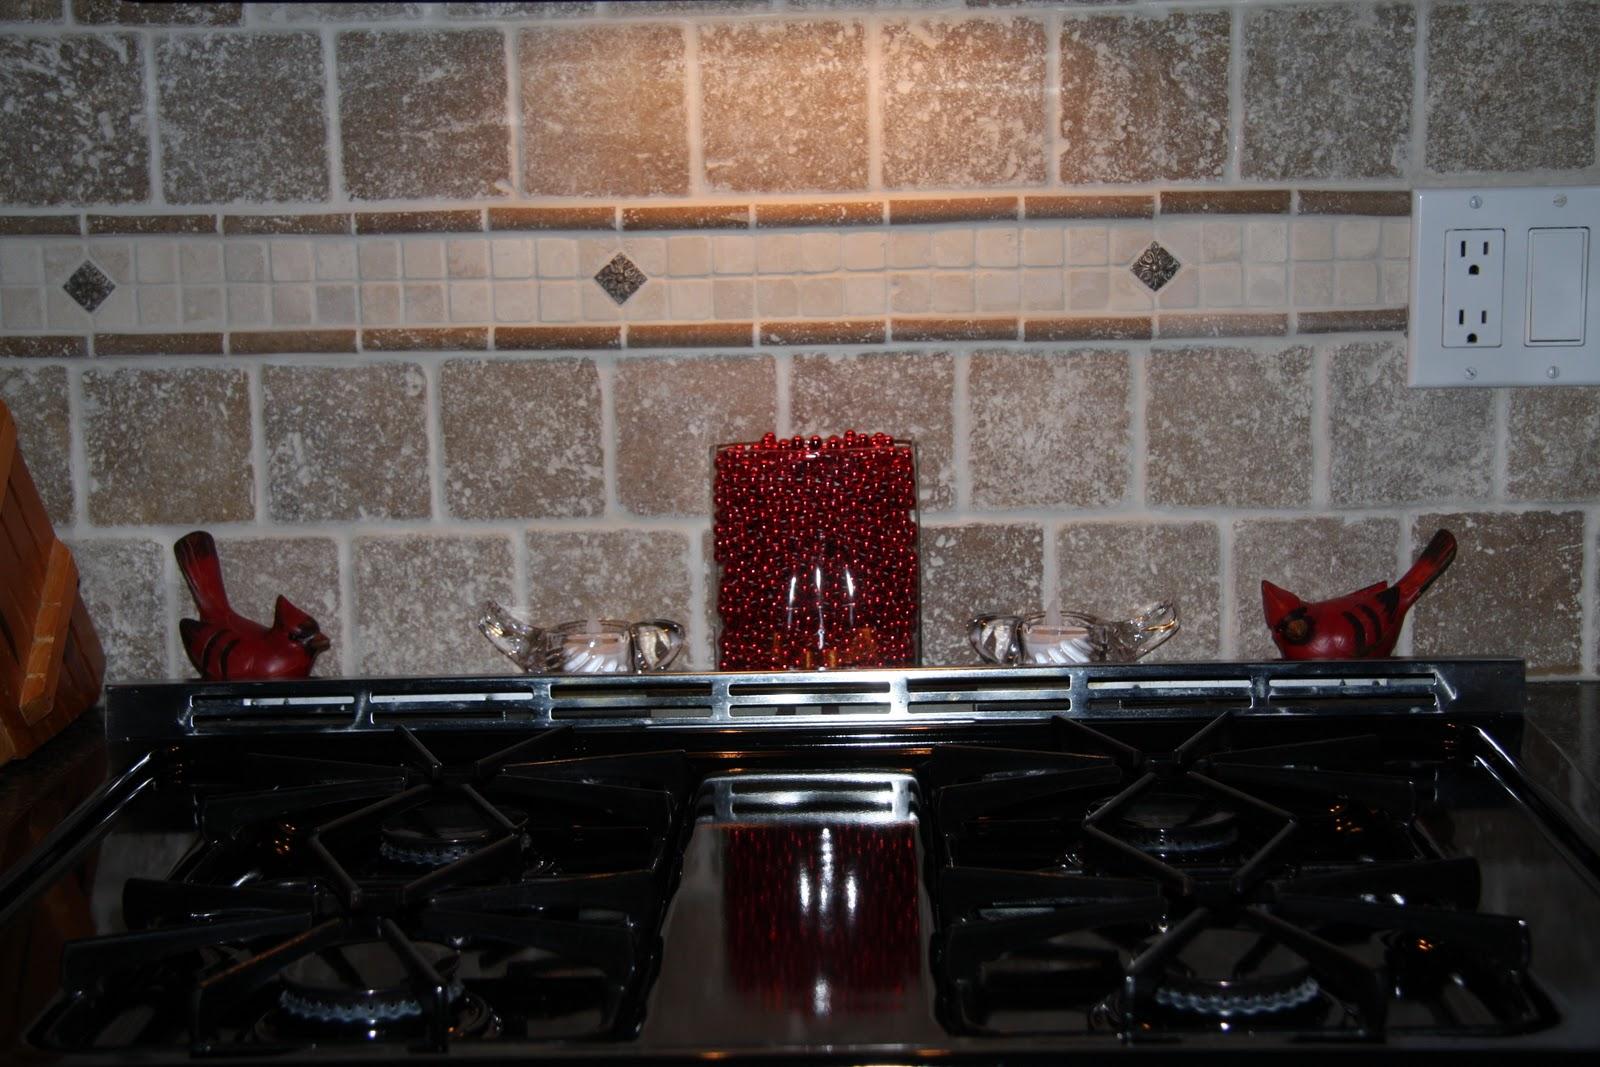 http://4.bp.blogspot.com/_g2cVWjwcxRg/TM3gGGTucGI/AAAAAAAABck/8REOvFe4_LQ/s1600/Behind+stove.JPG